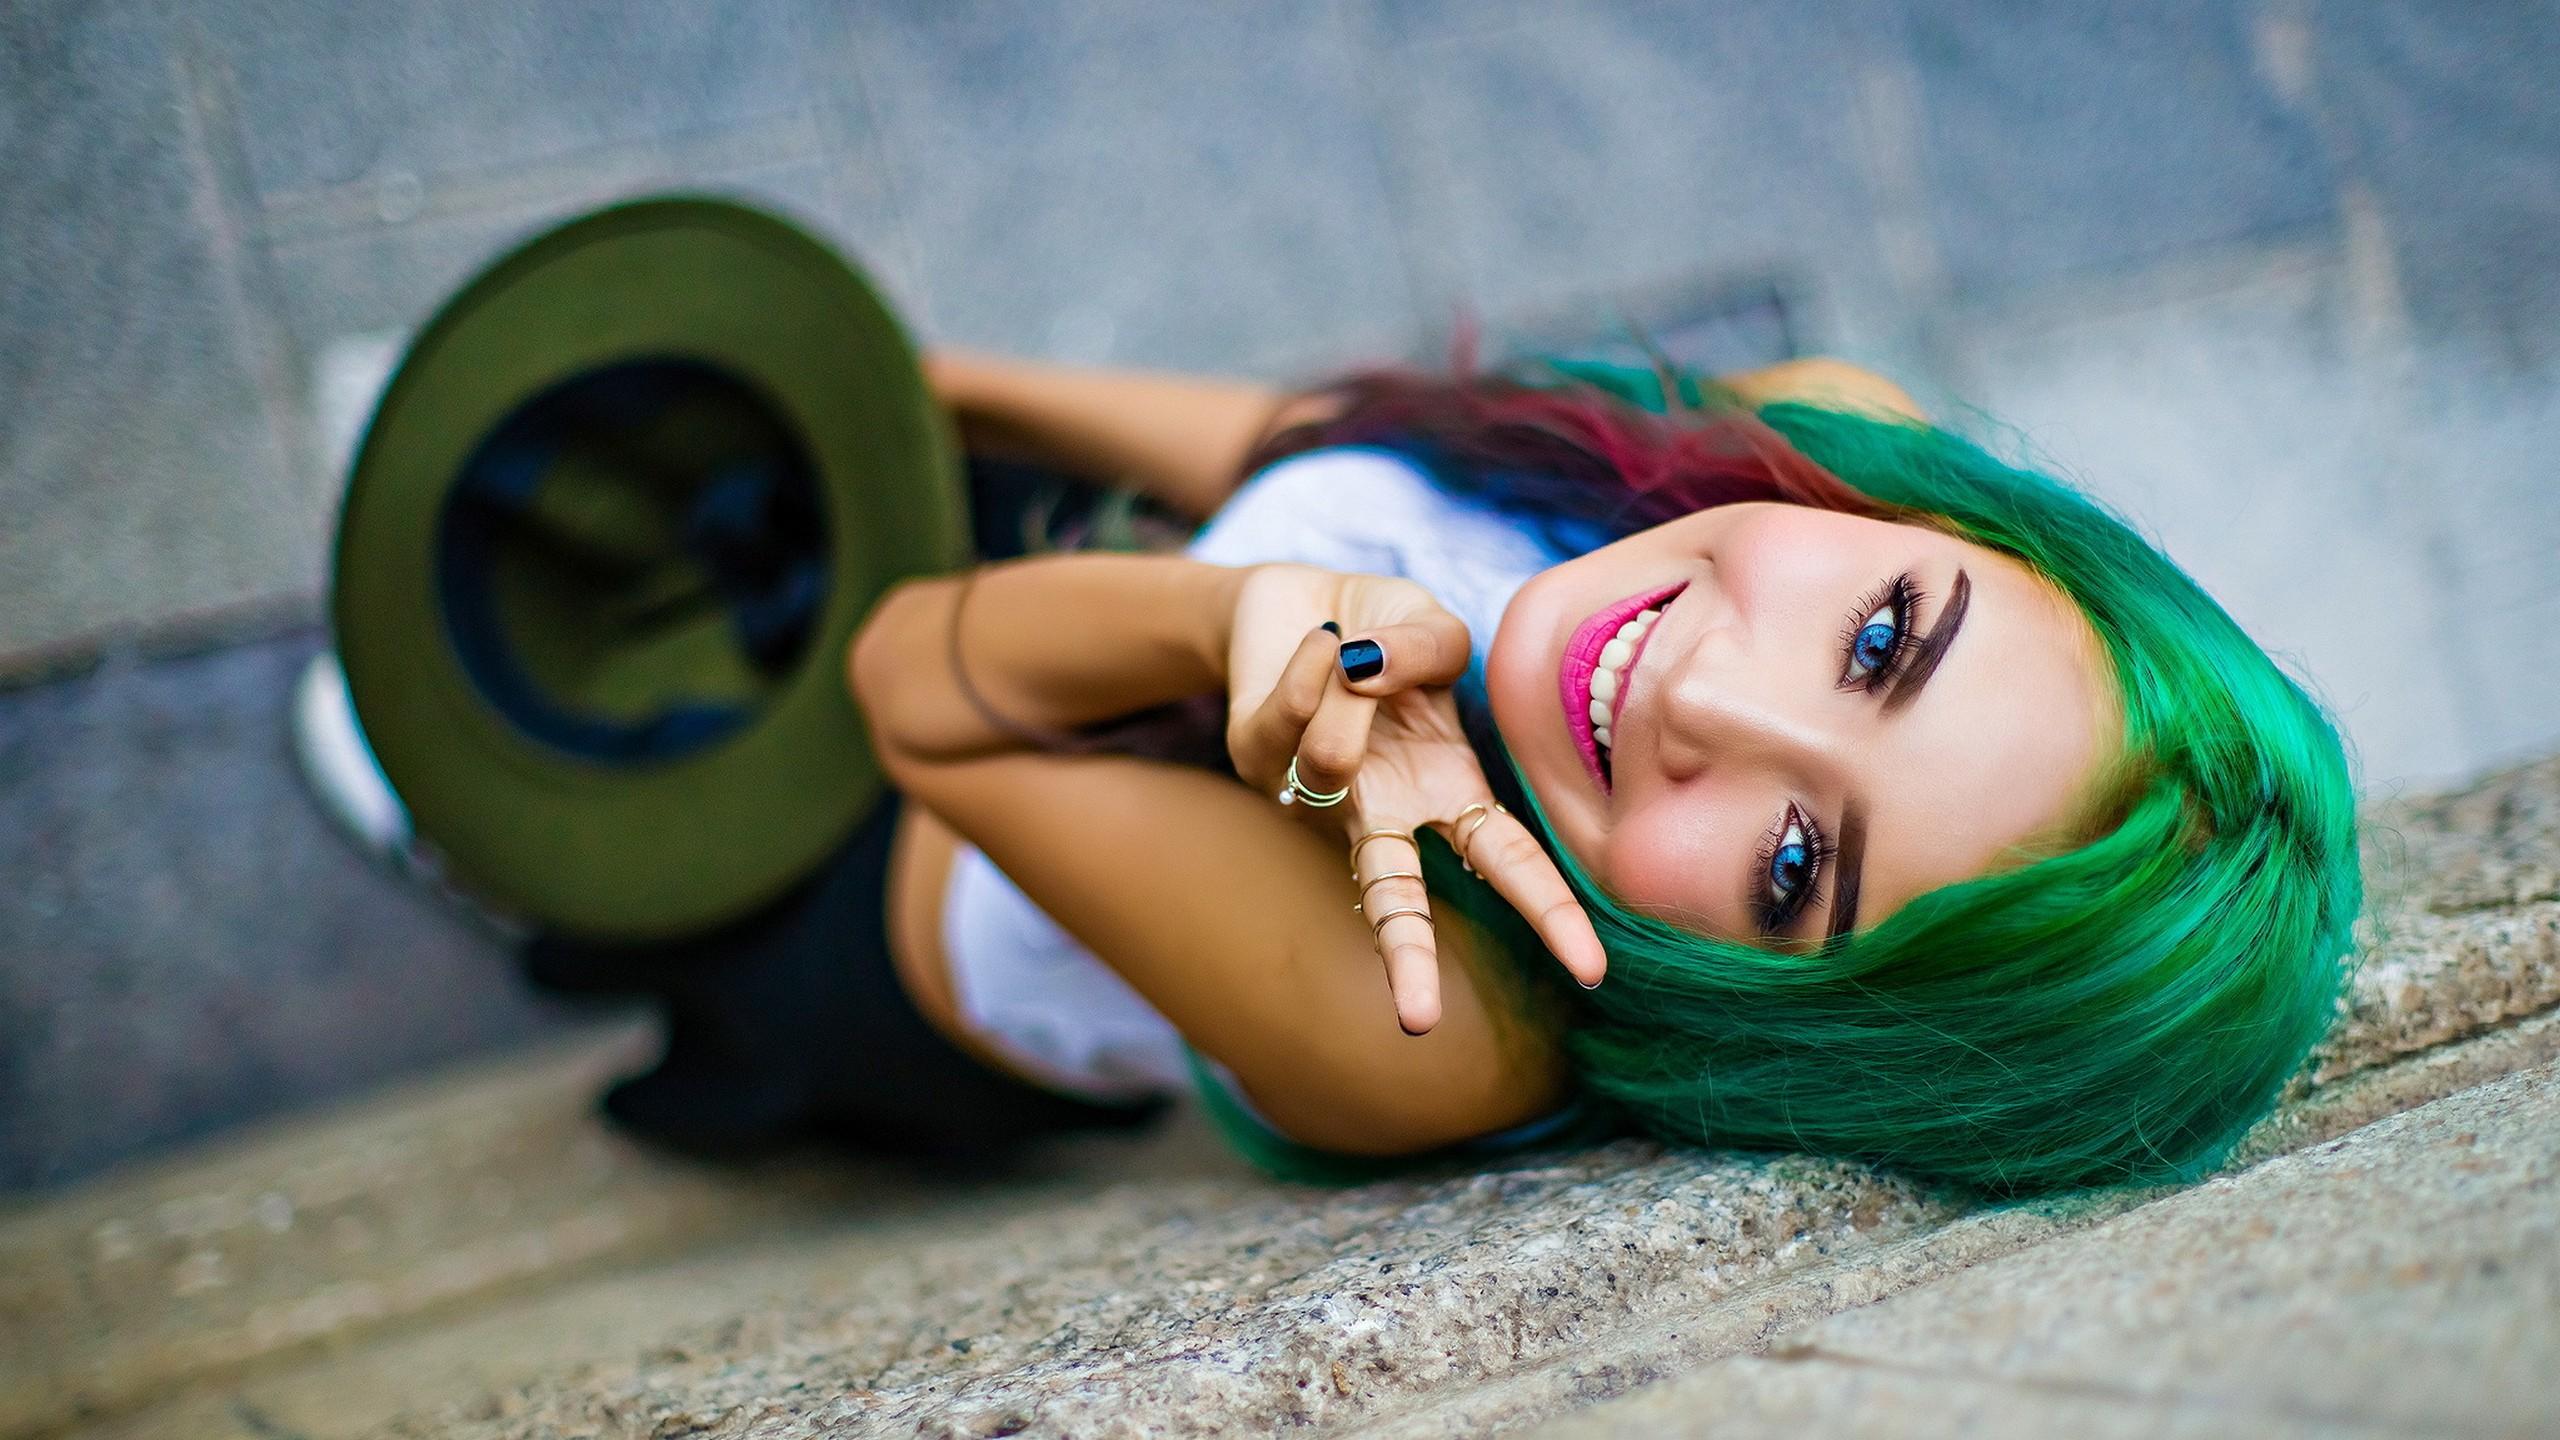 Wallpaper Women Photography Dress Blue Green Hair Toy Skin